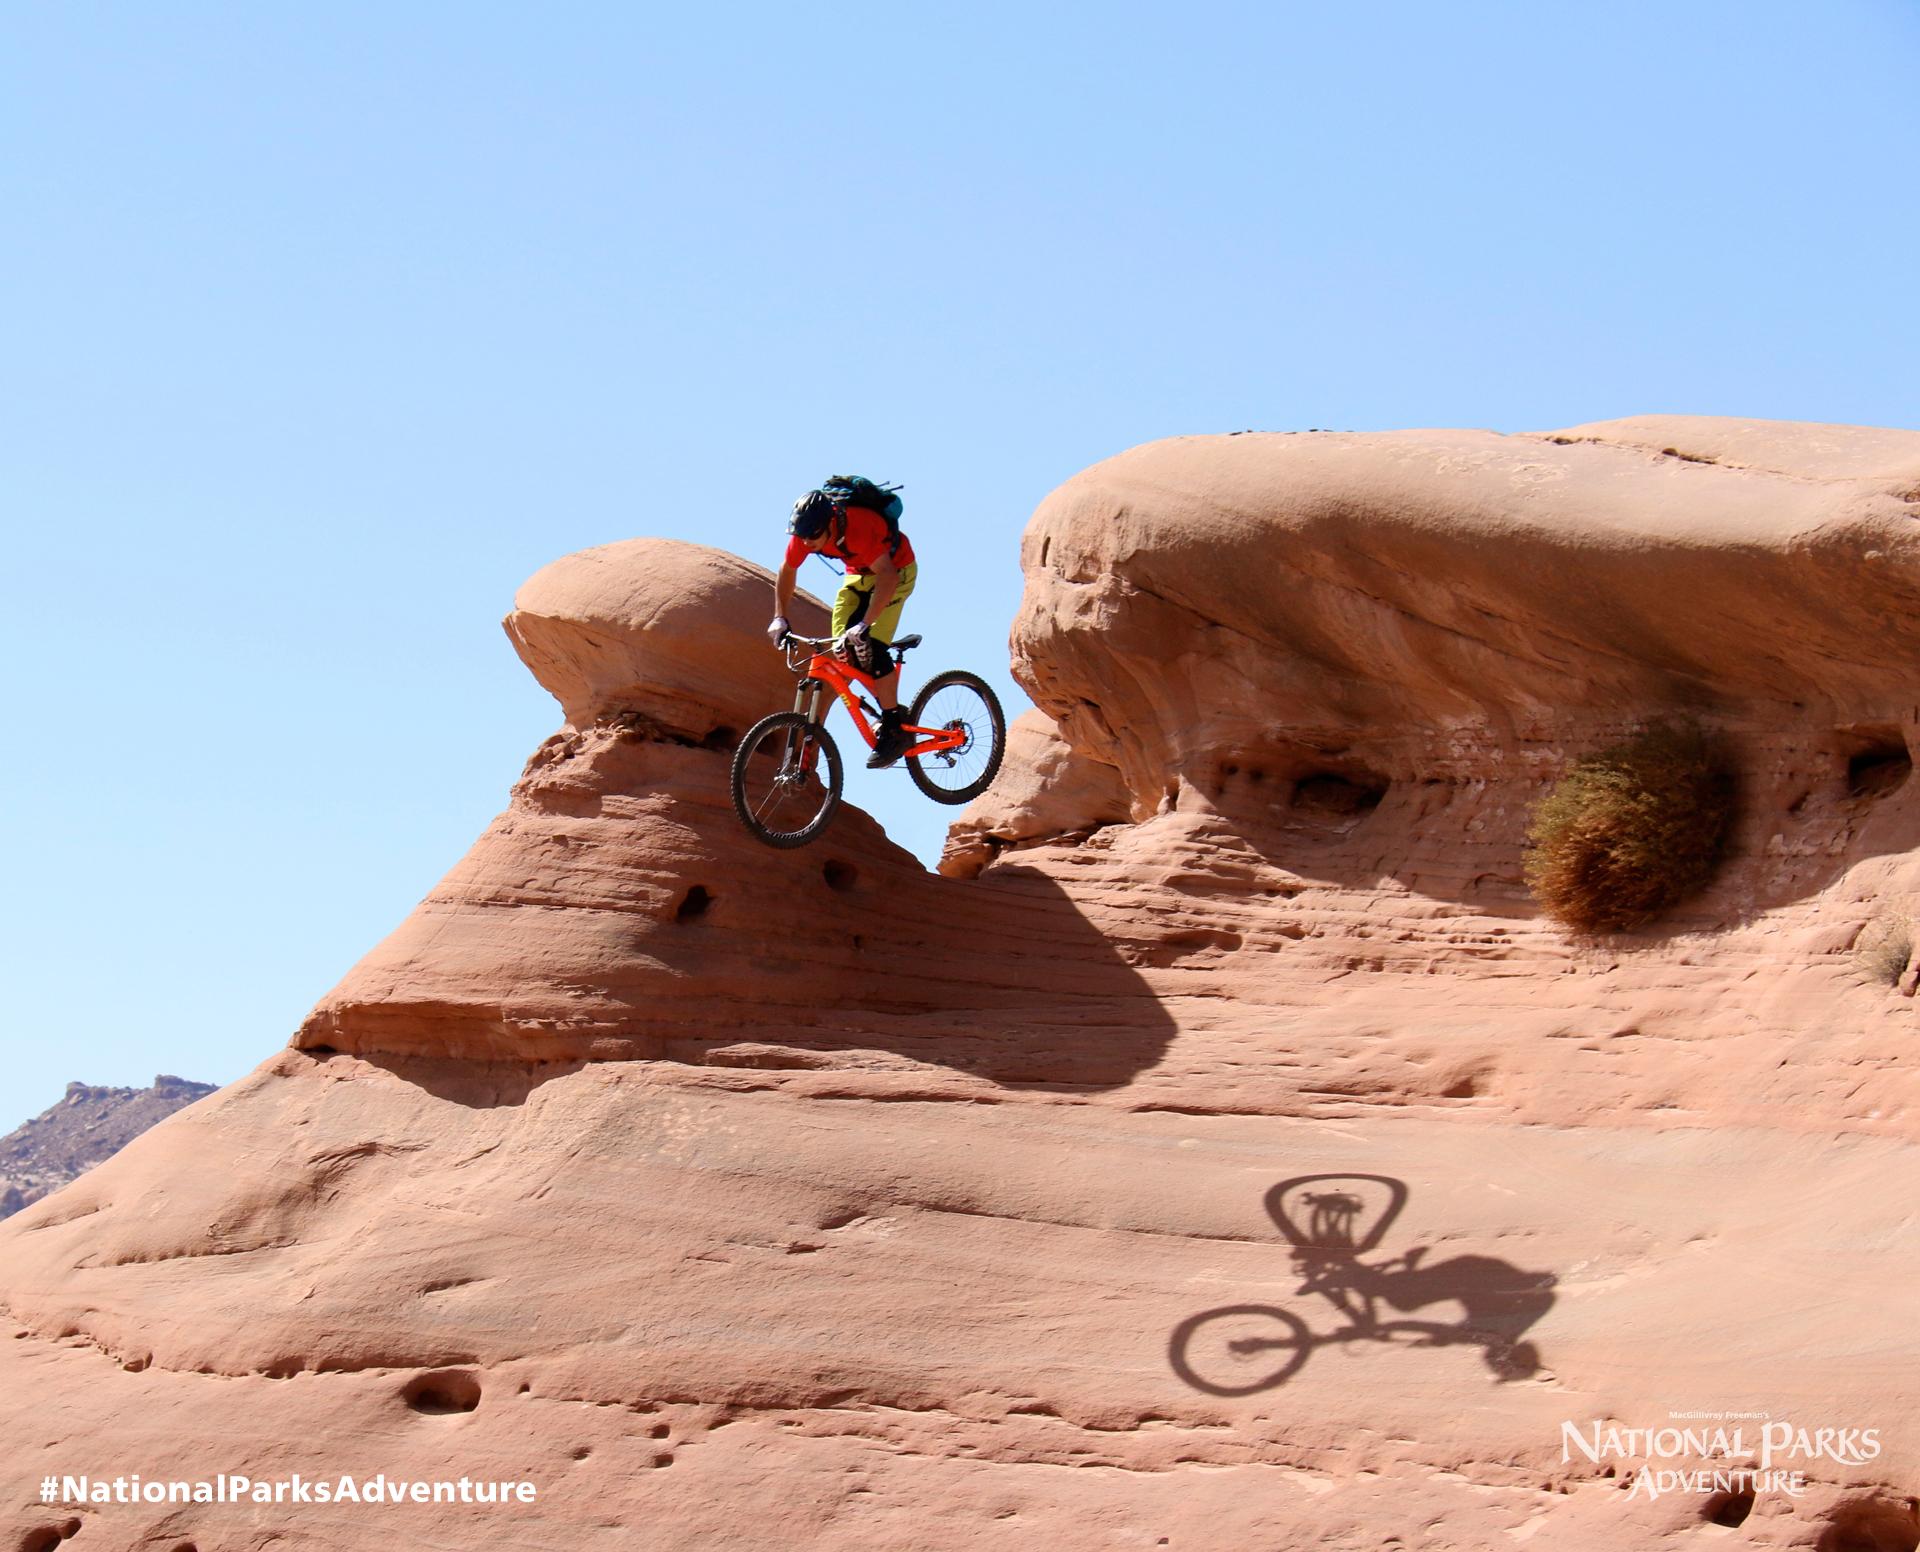 Mountain biker Eric Porter jumps over a mushroom boulder in Moab, Utah. Courtesy of MacGillivray Freeman Films. Photographer: Barbara MacGillivray ©VisitTheUSA.com